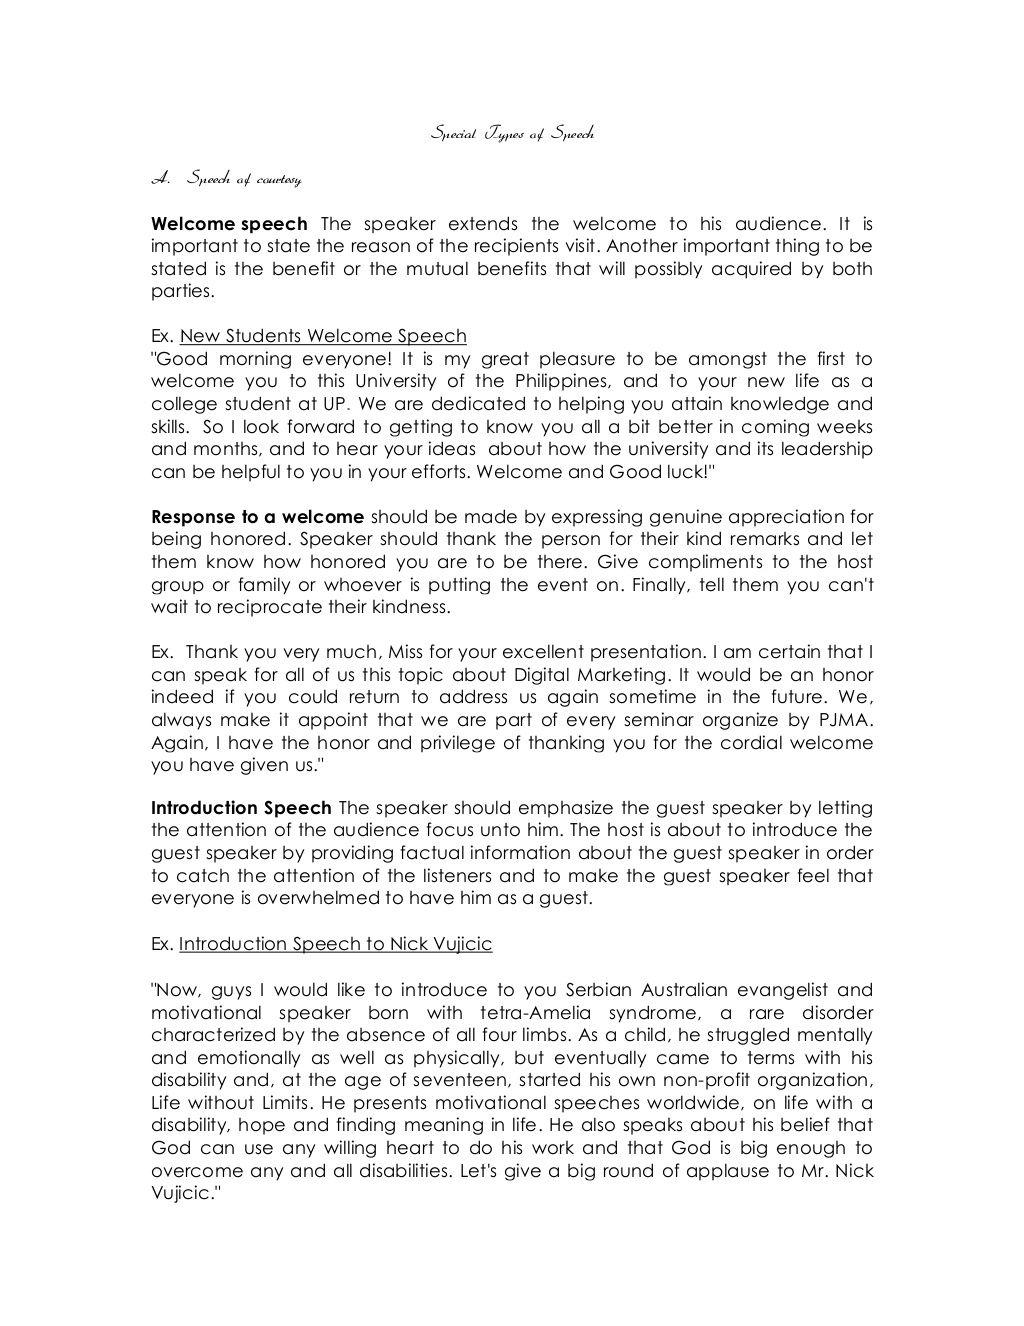 Pengacaraan majlis (emceeing for official function in malaysia contex….